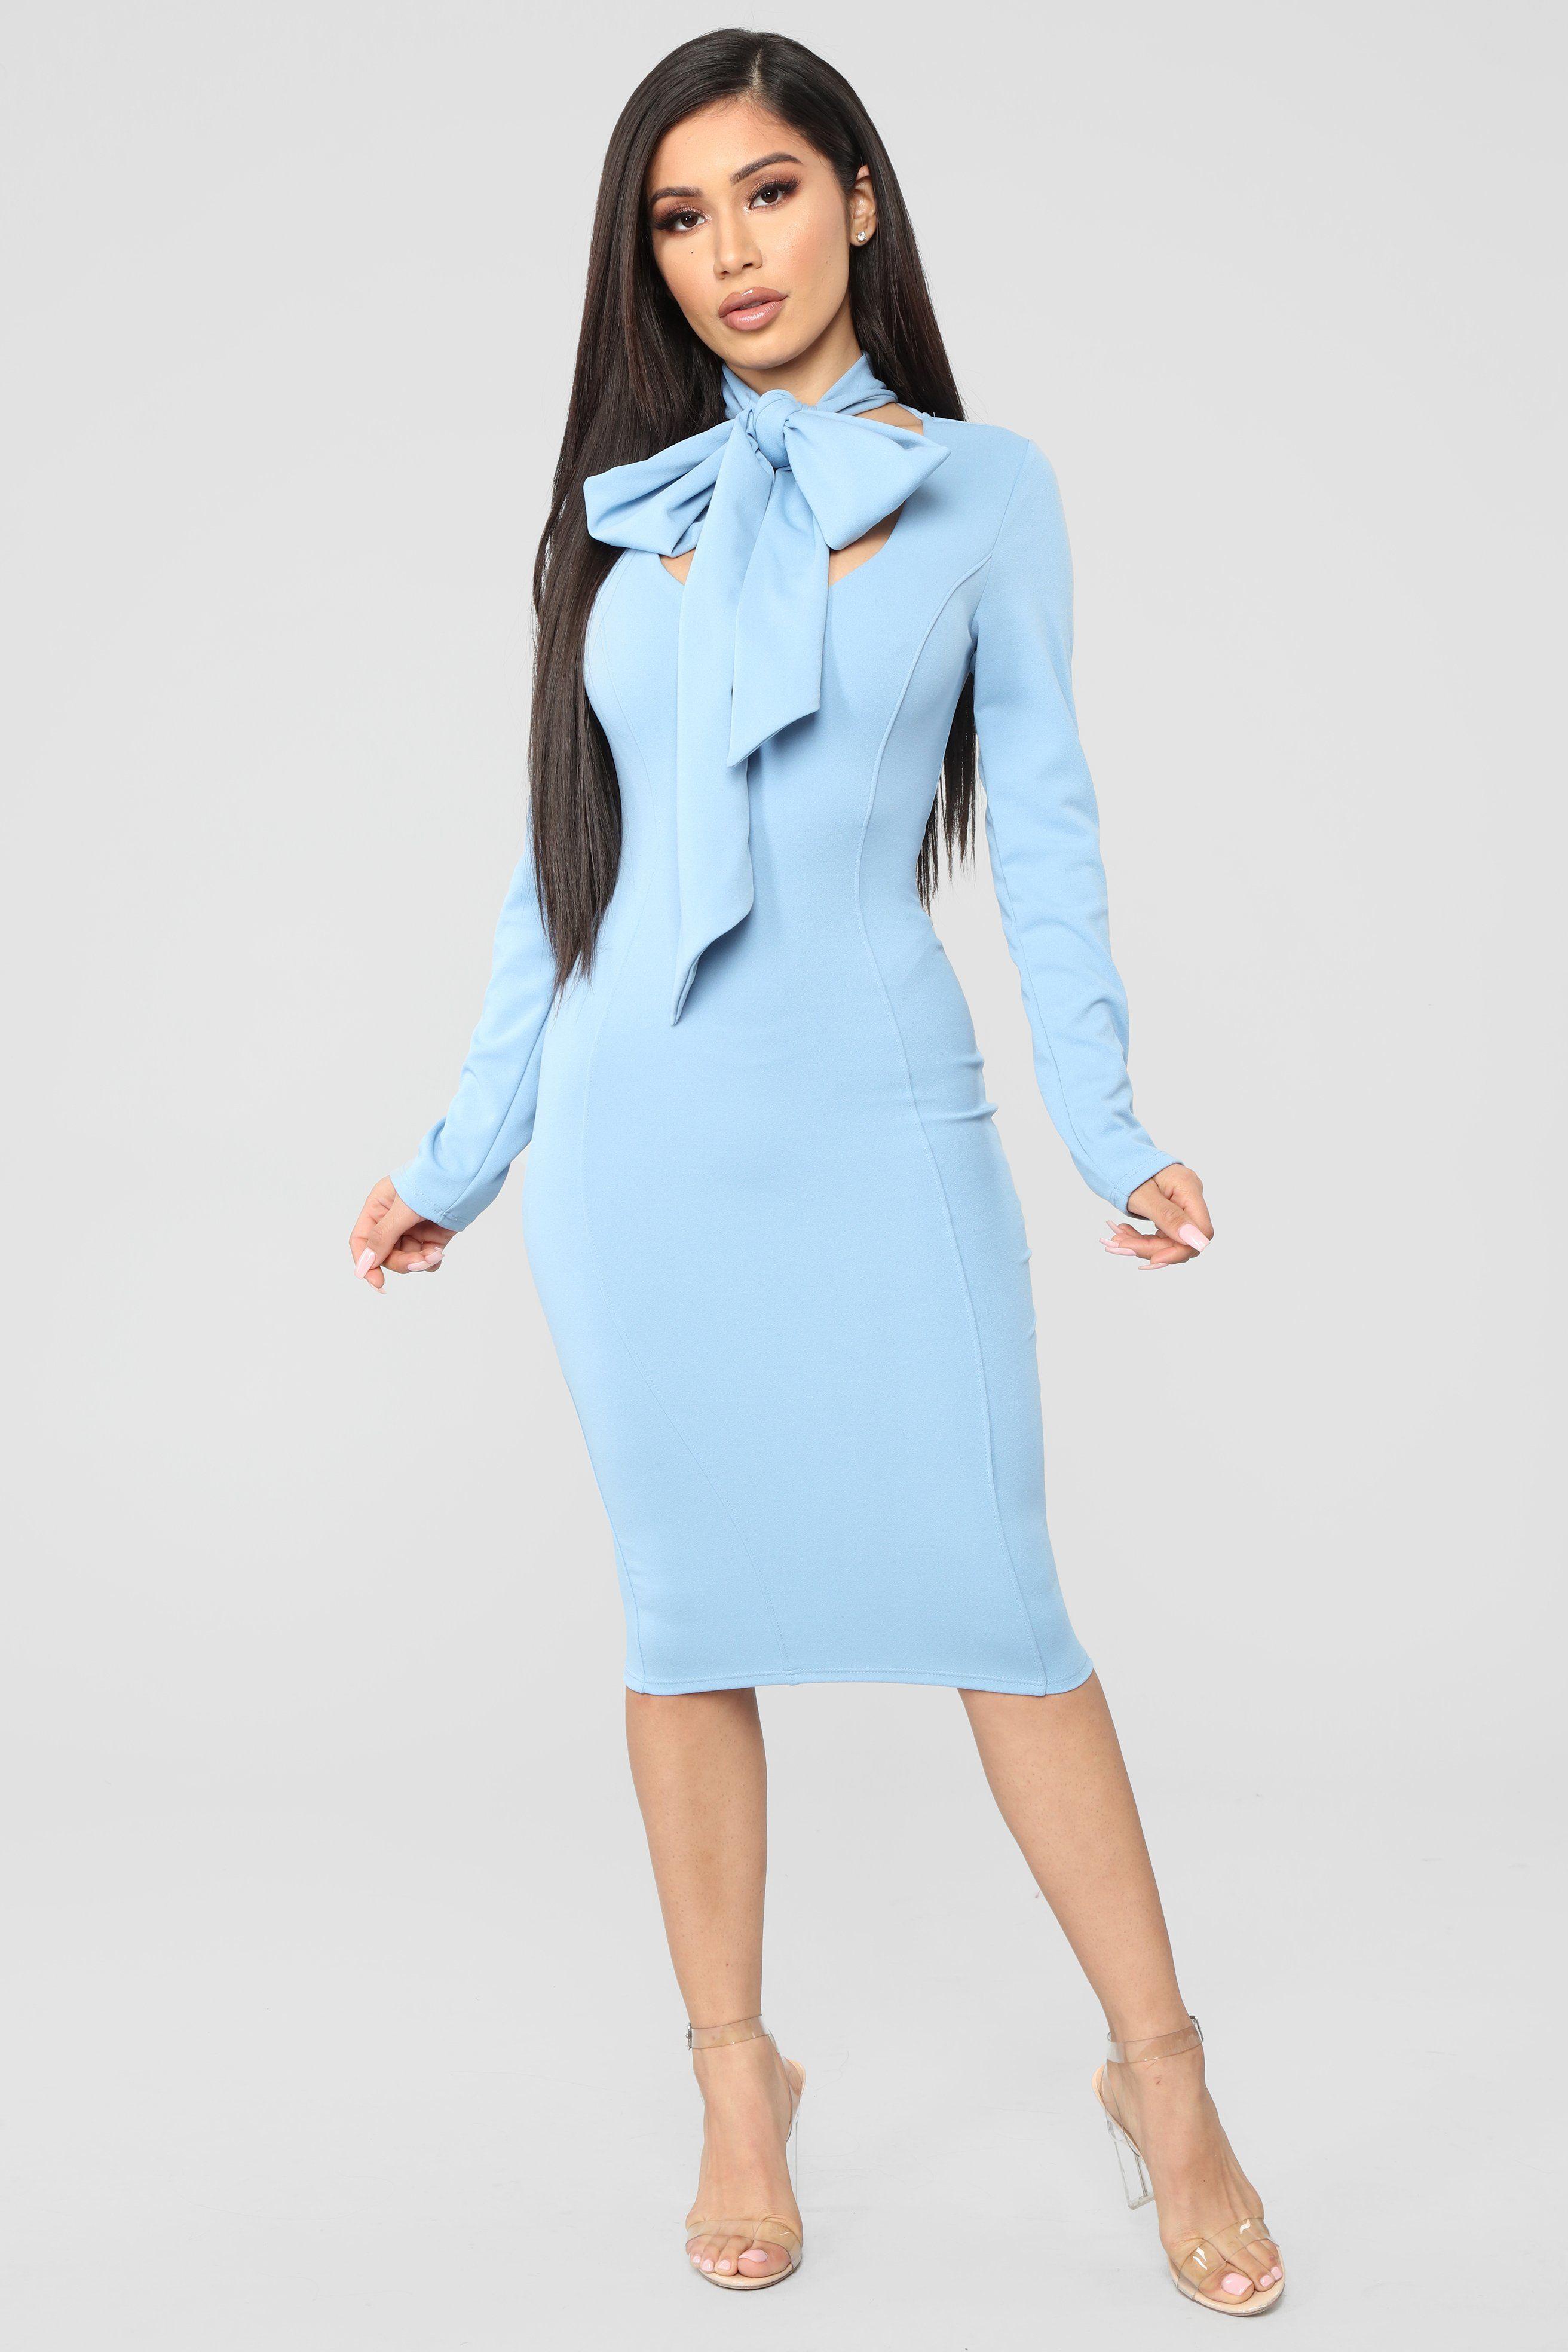 Just The Way I Am Dress Light Blue Light blue dresses